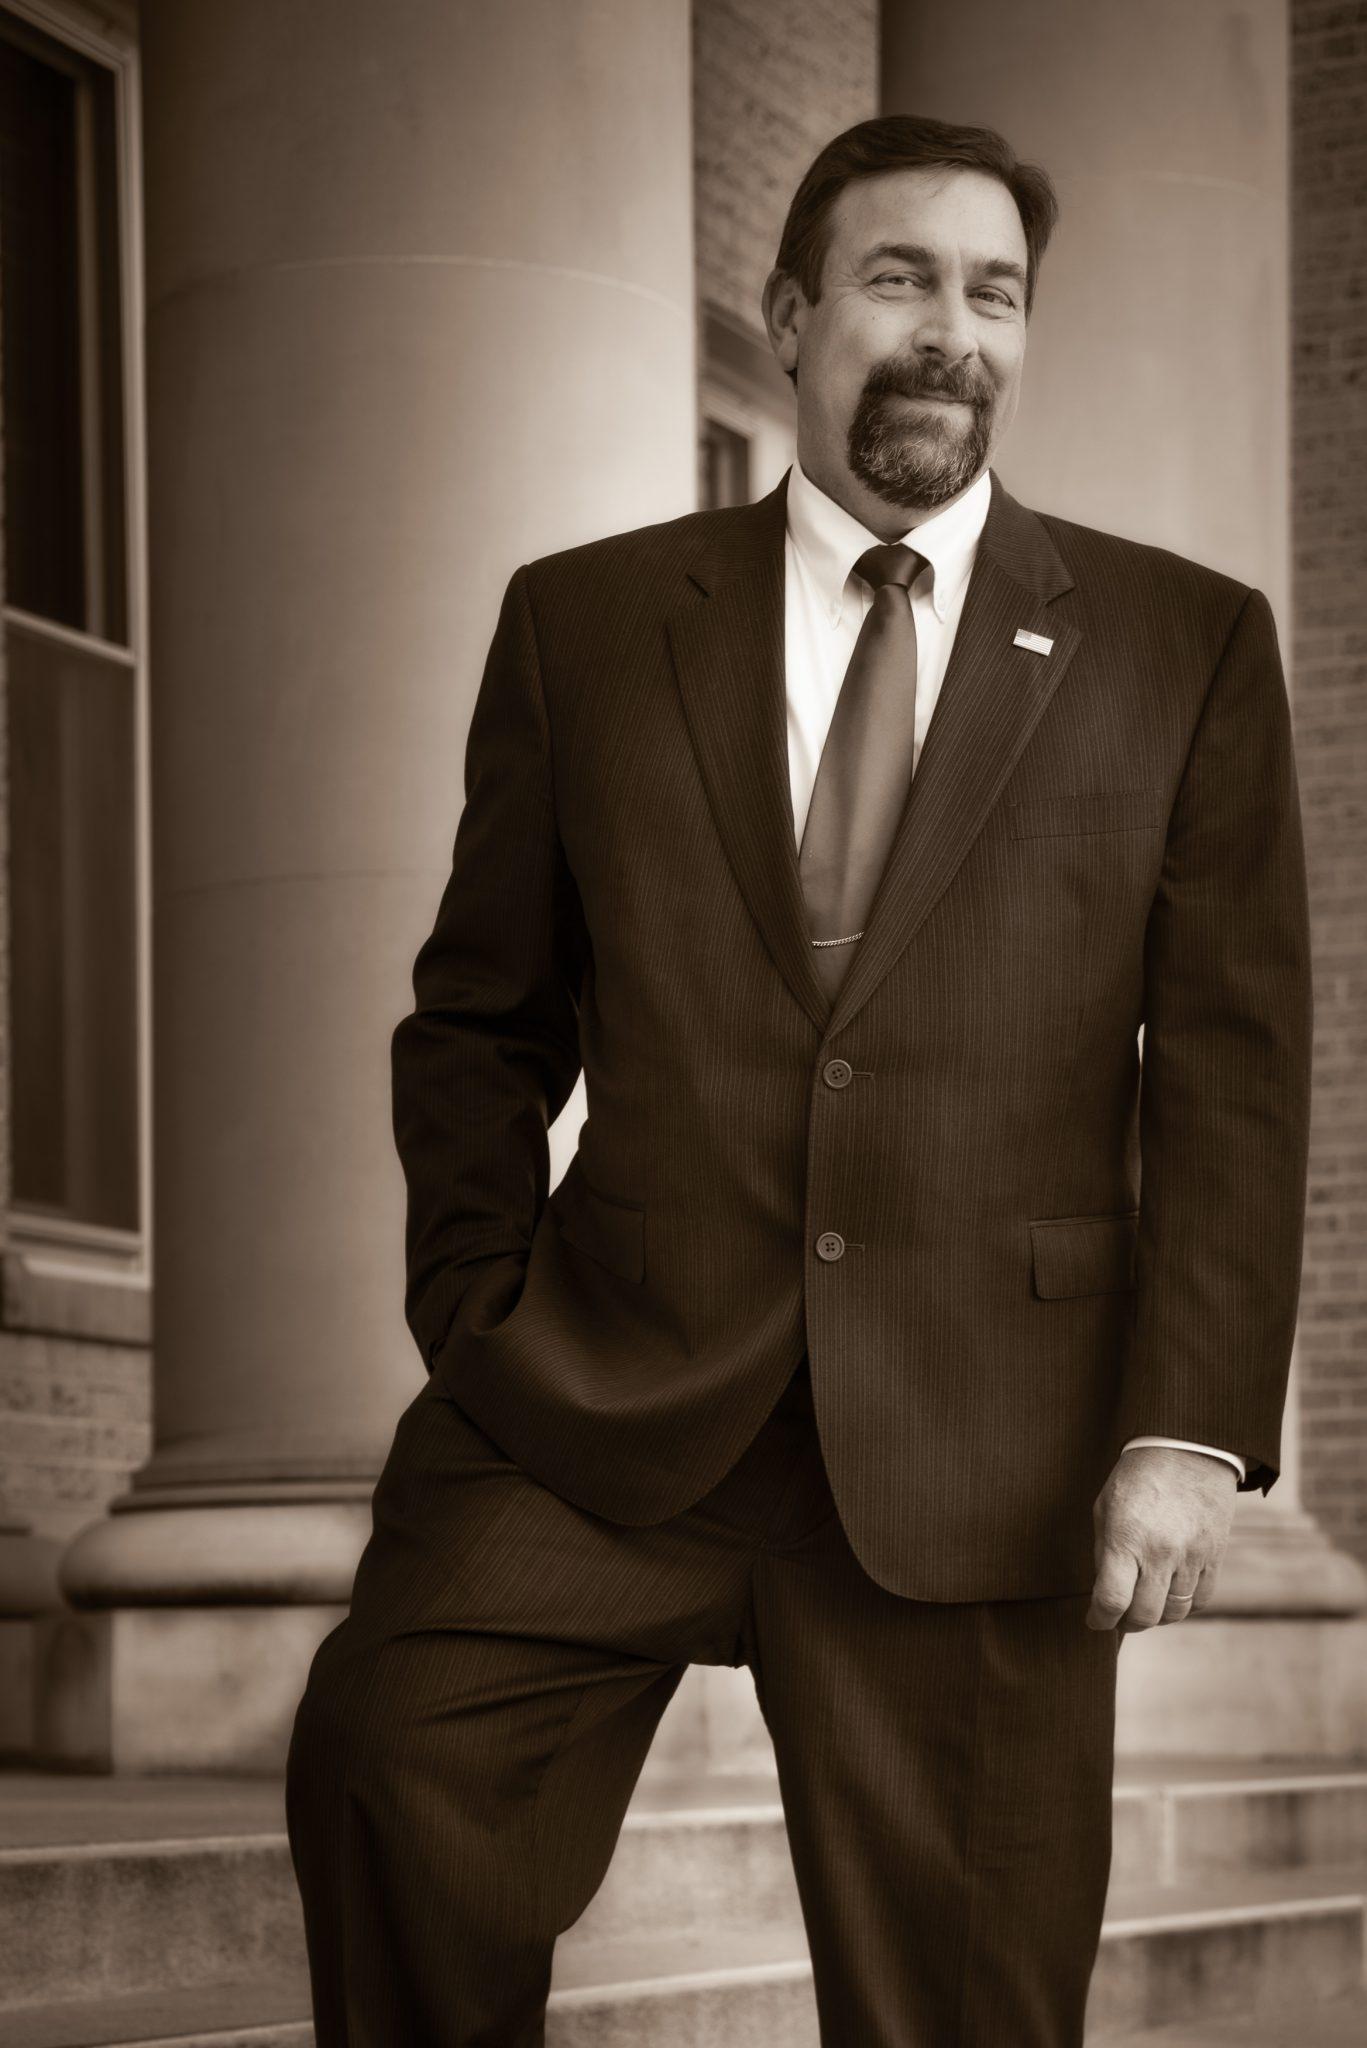 Tony Frank, Chancellor and President of CSU